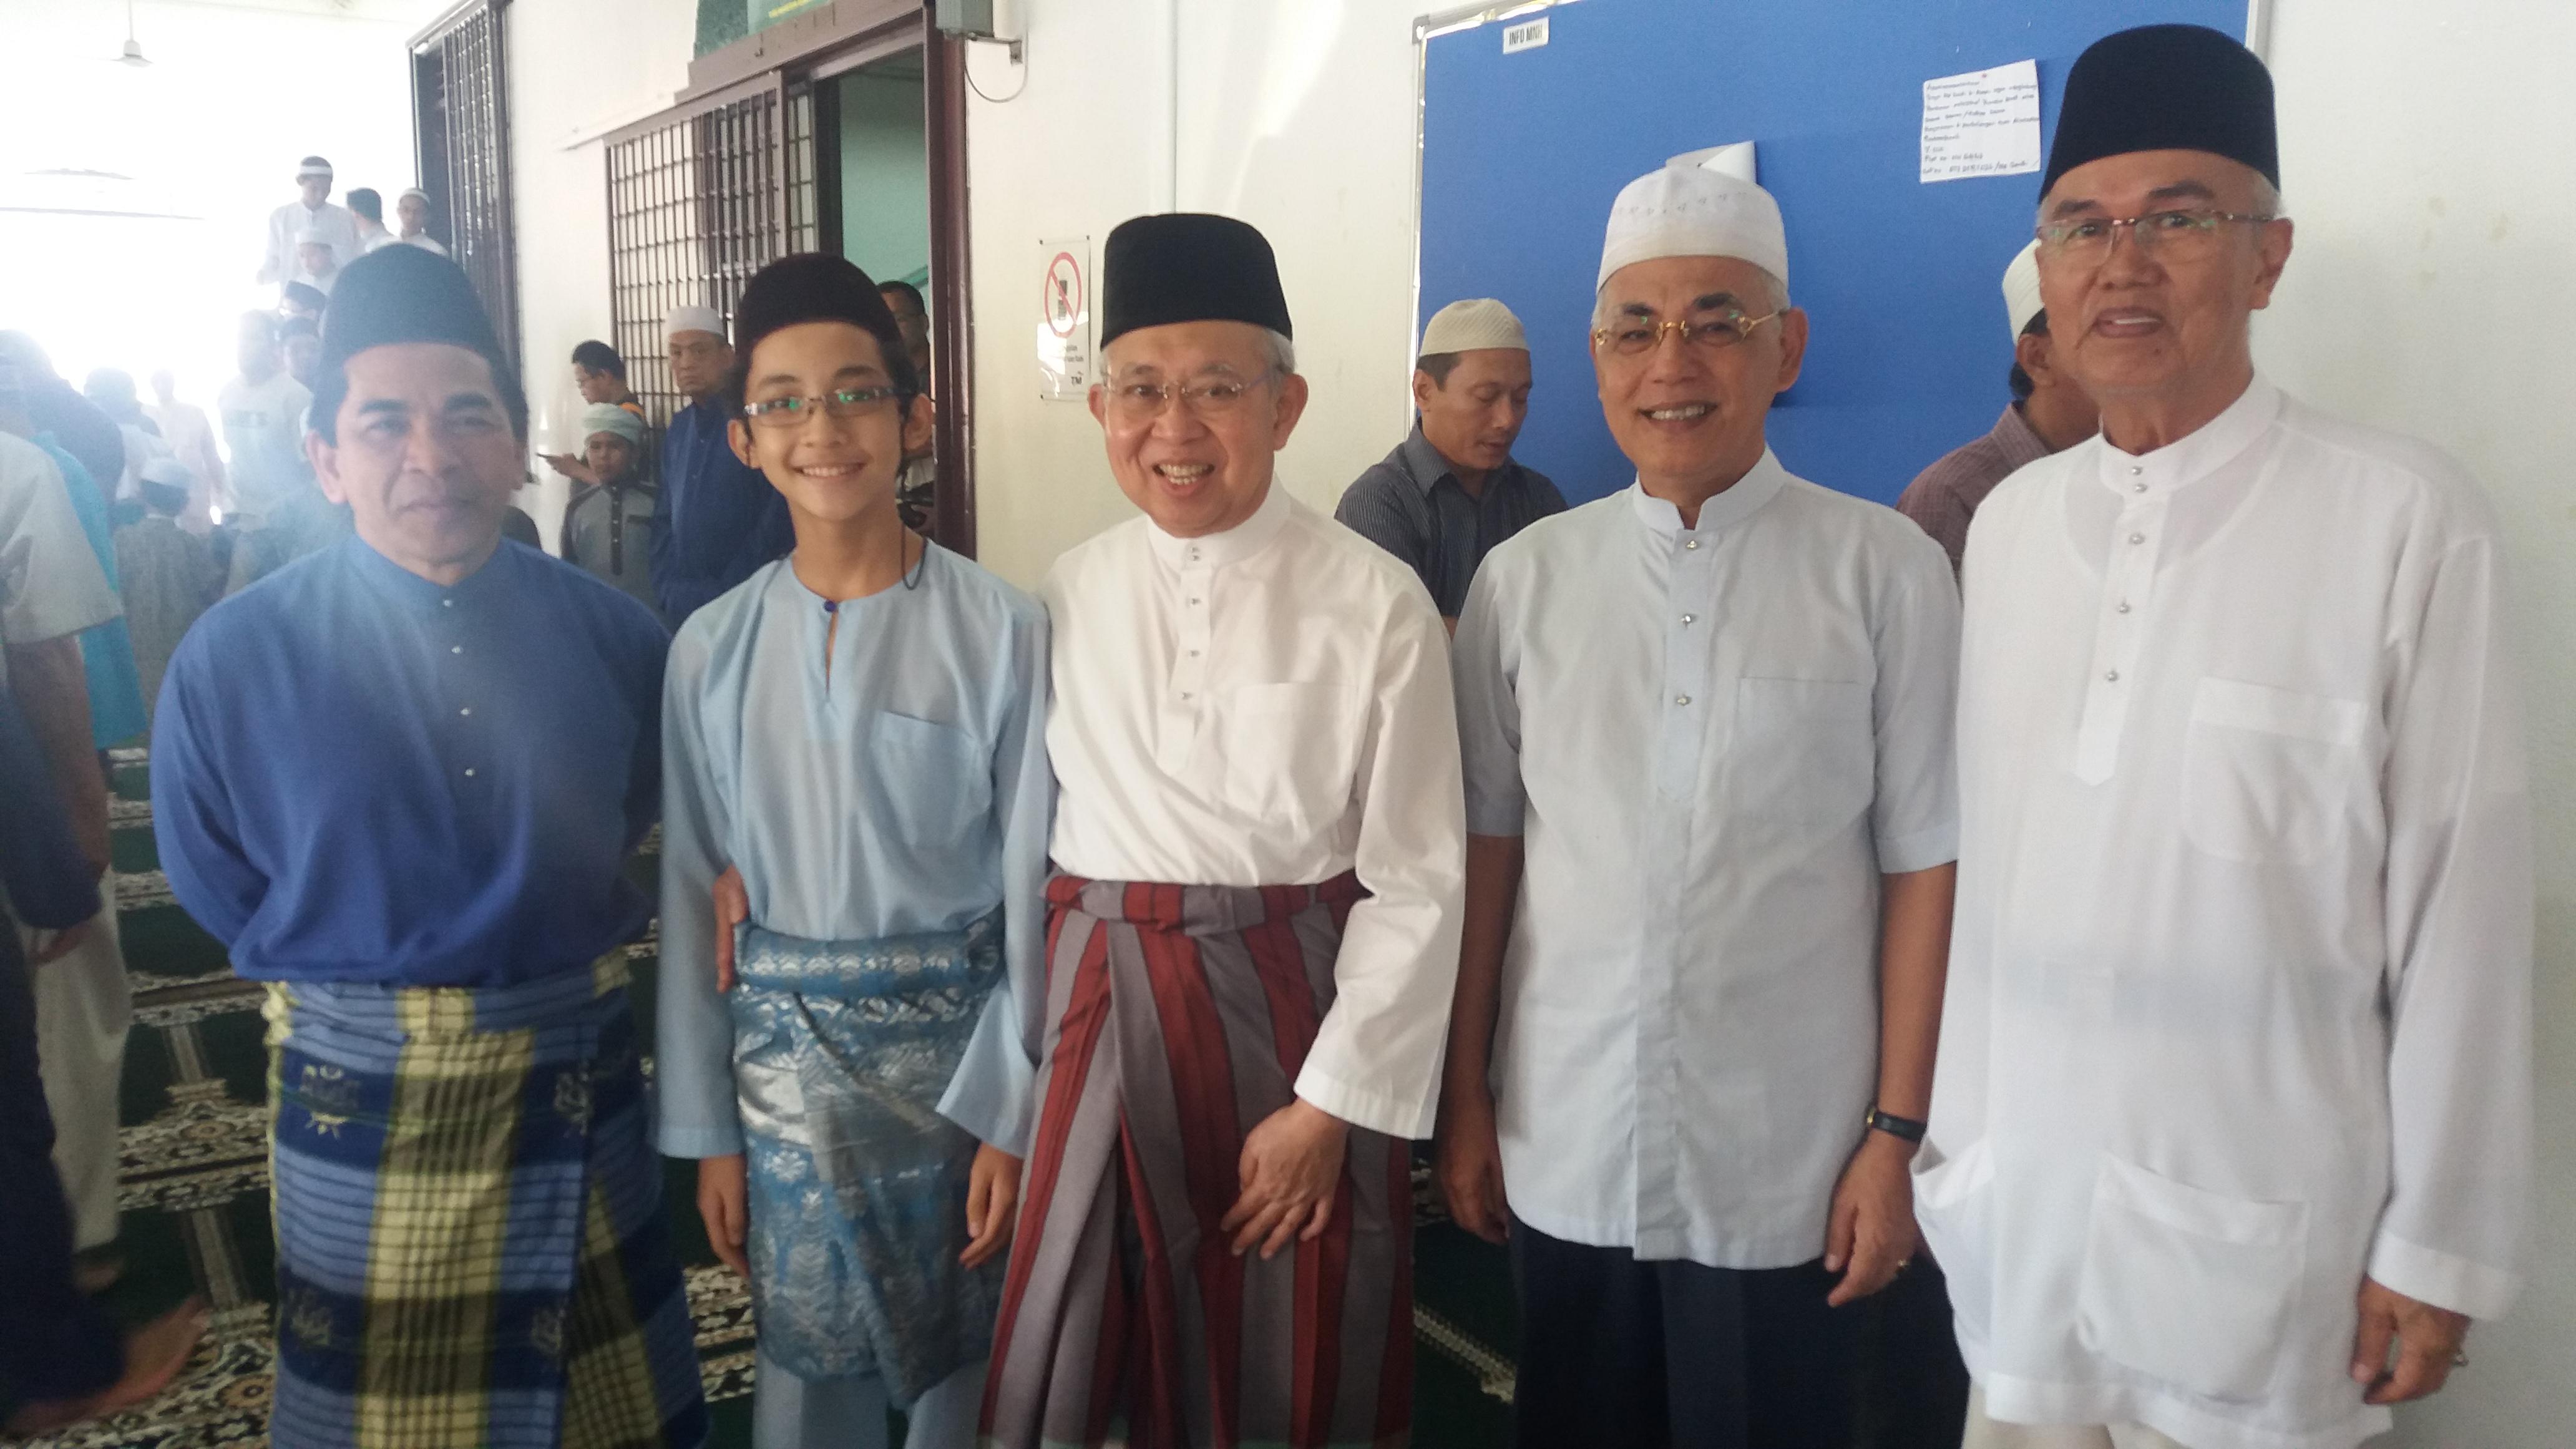 A group photo with Ku Li after our Friday prayer, July 15, 2016.